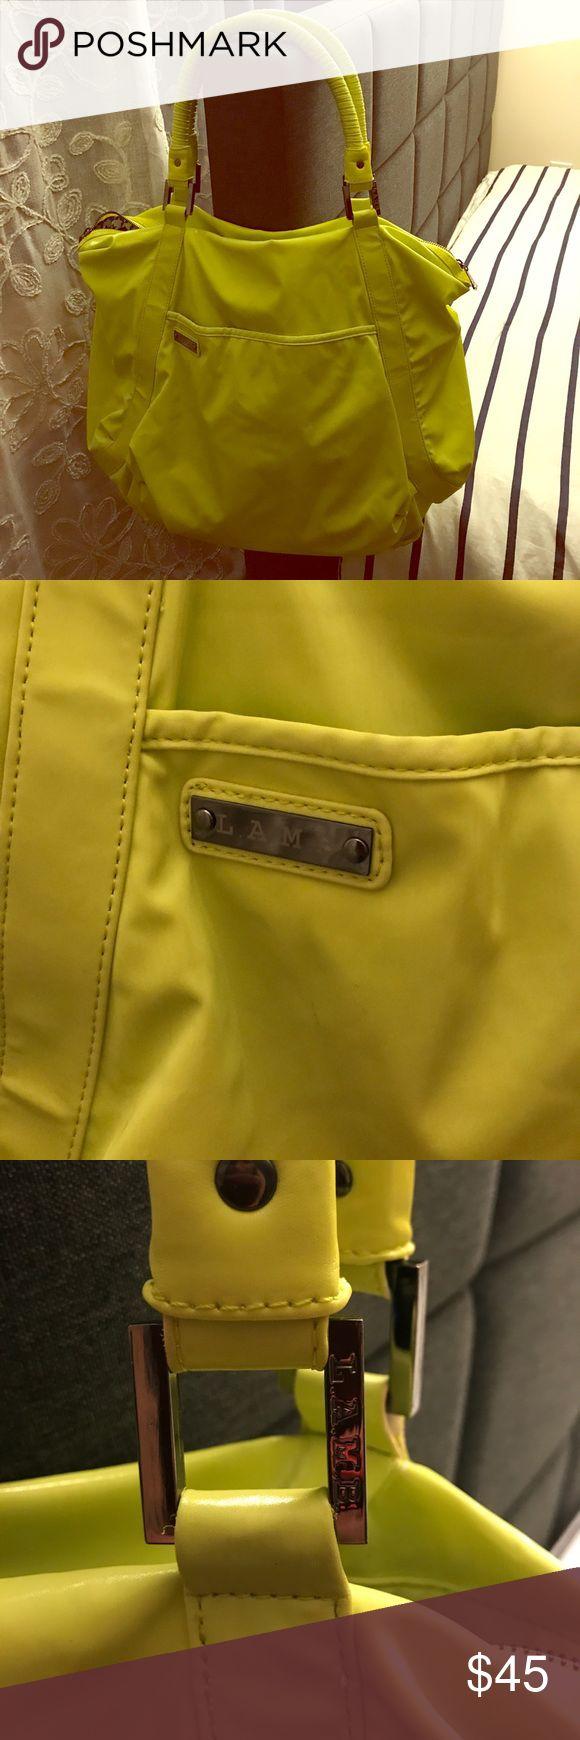 Bag L.A.M.B bag used LAMB Bags Shoulder Bags